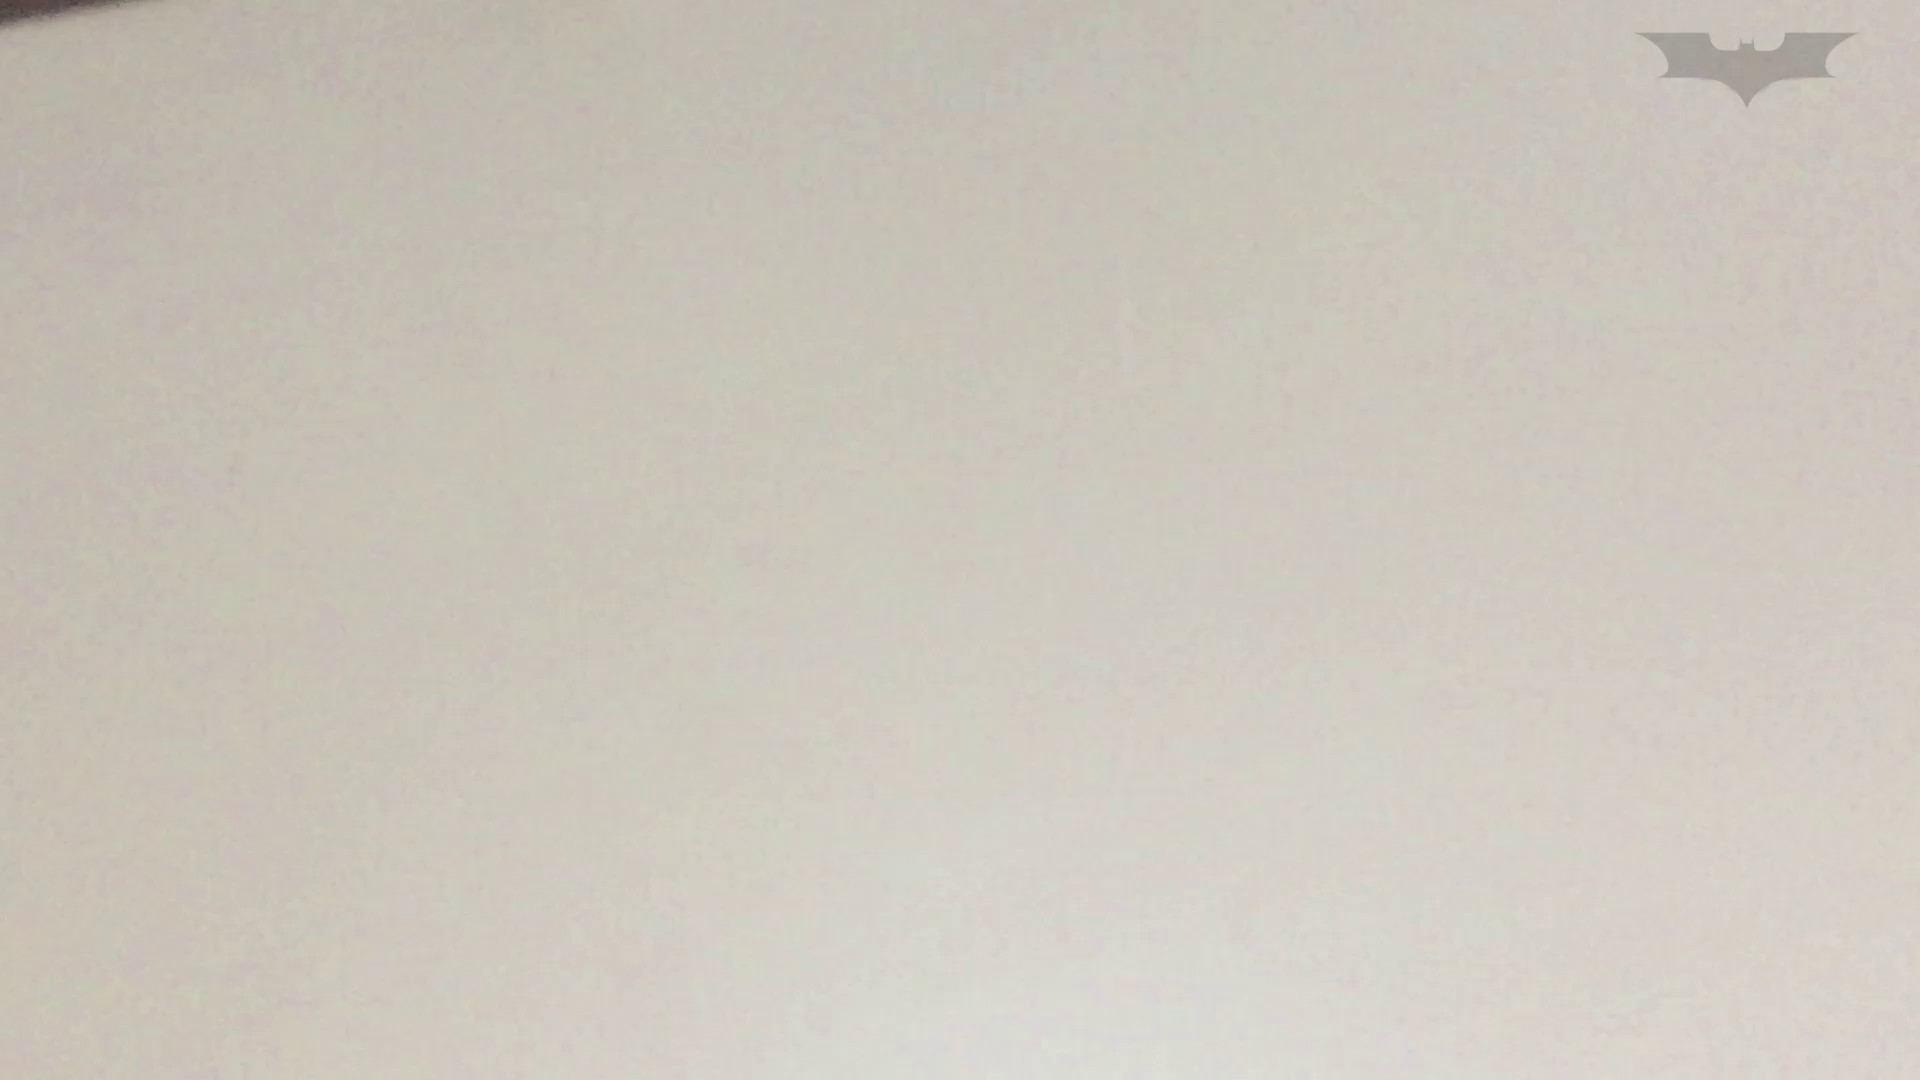 JD盗撮 美女の洗面所の秘密 Vol.74 洗面所シーン オメコ動画キャプチャ 109画像 47